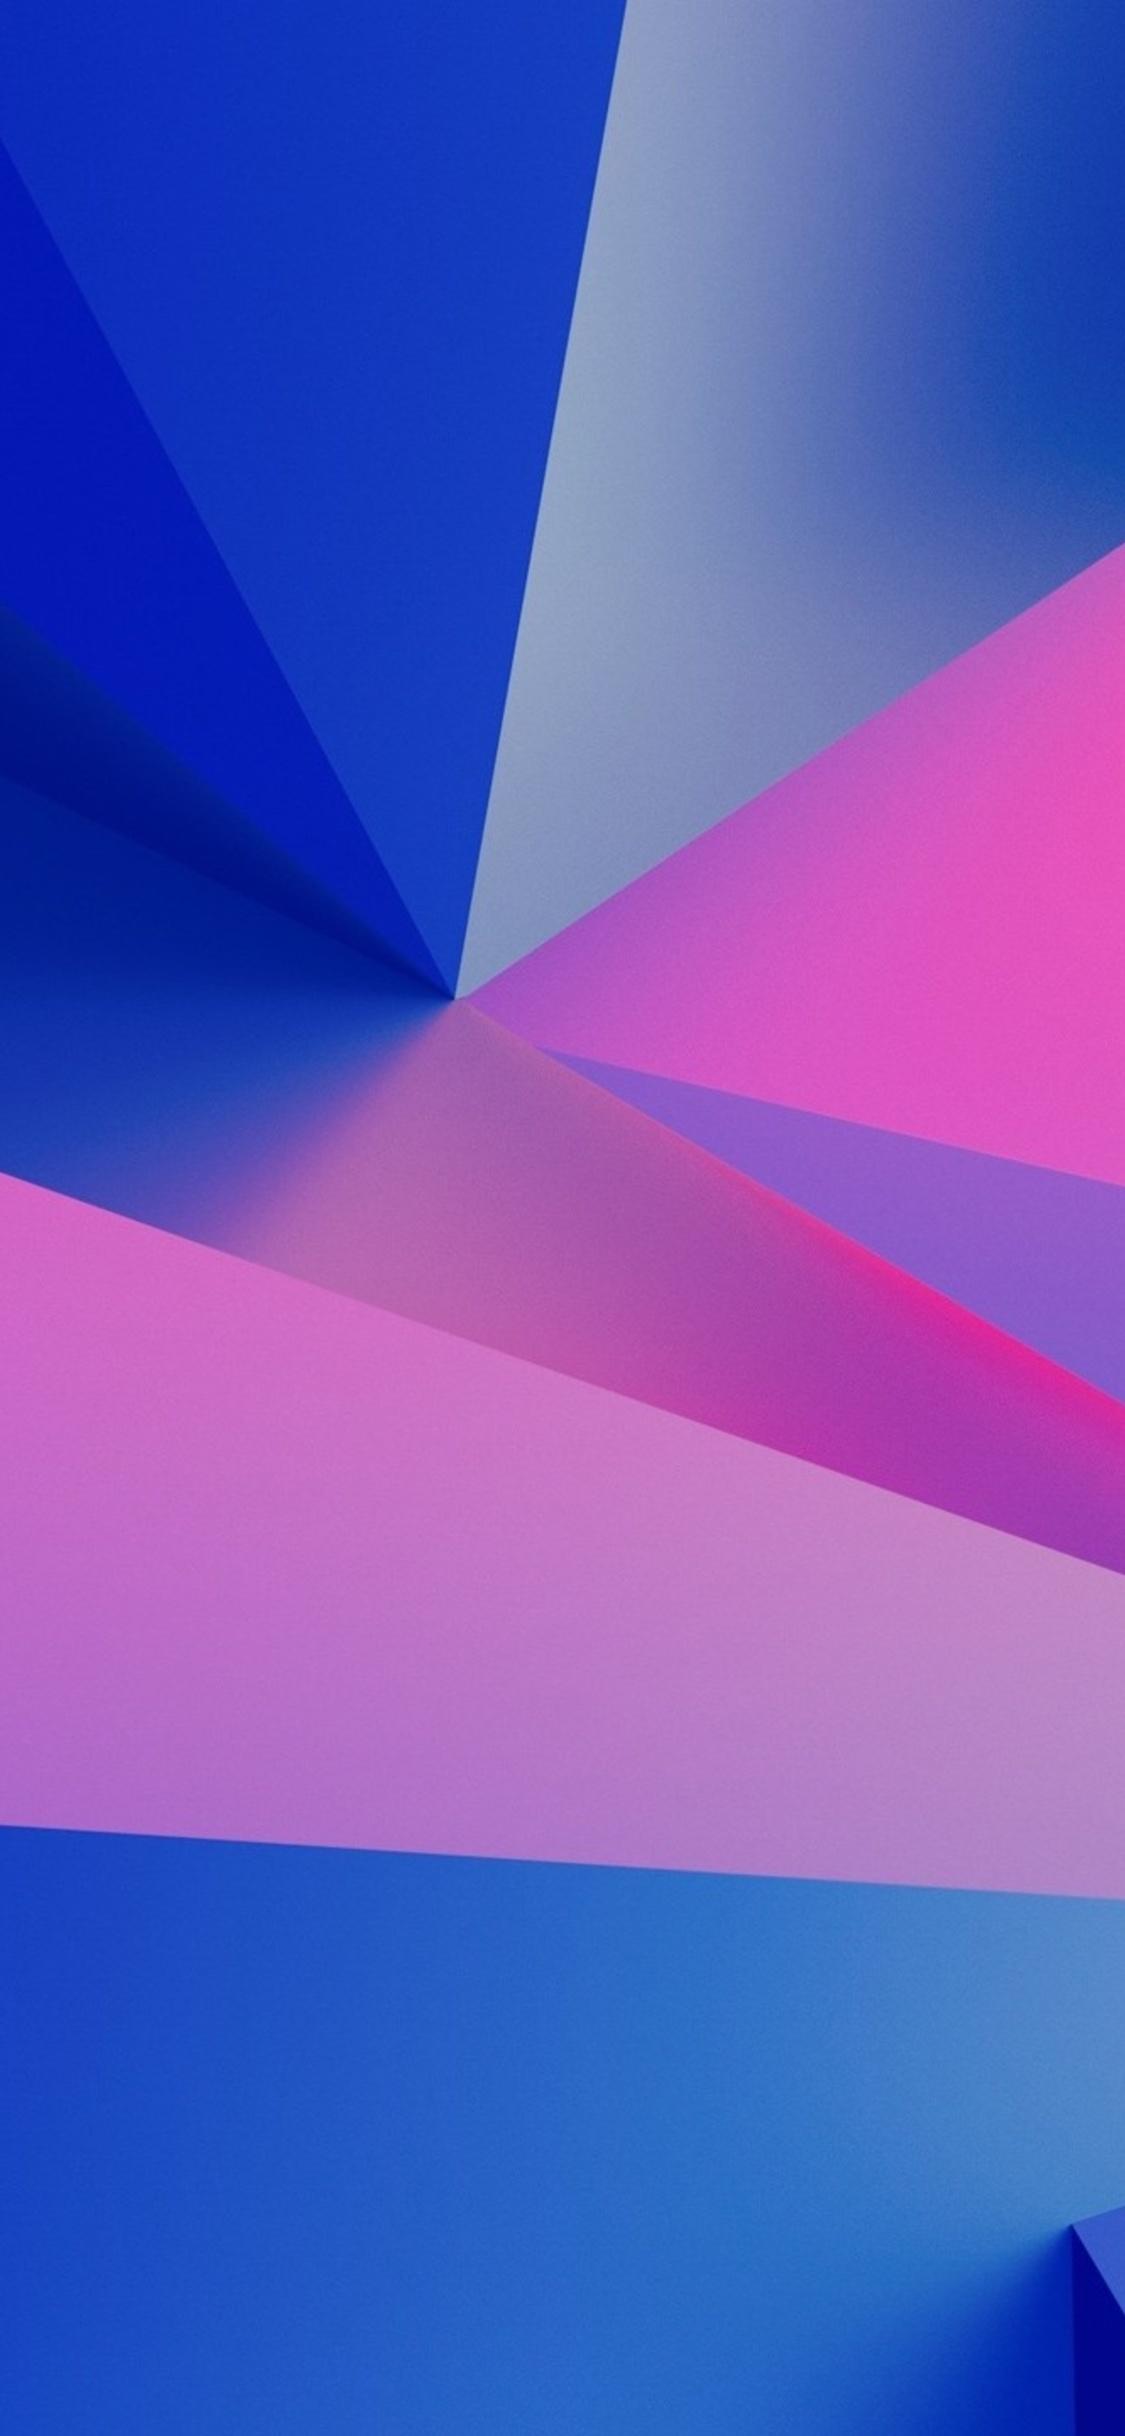 3d-geometry-abstract-bv.jpg